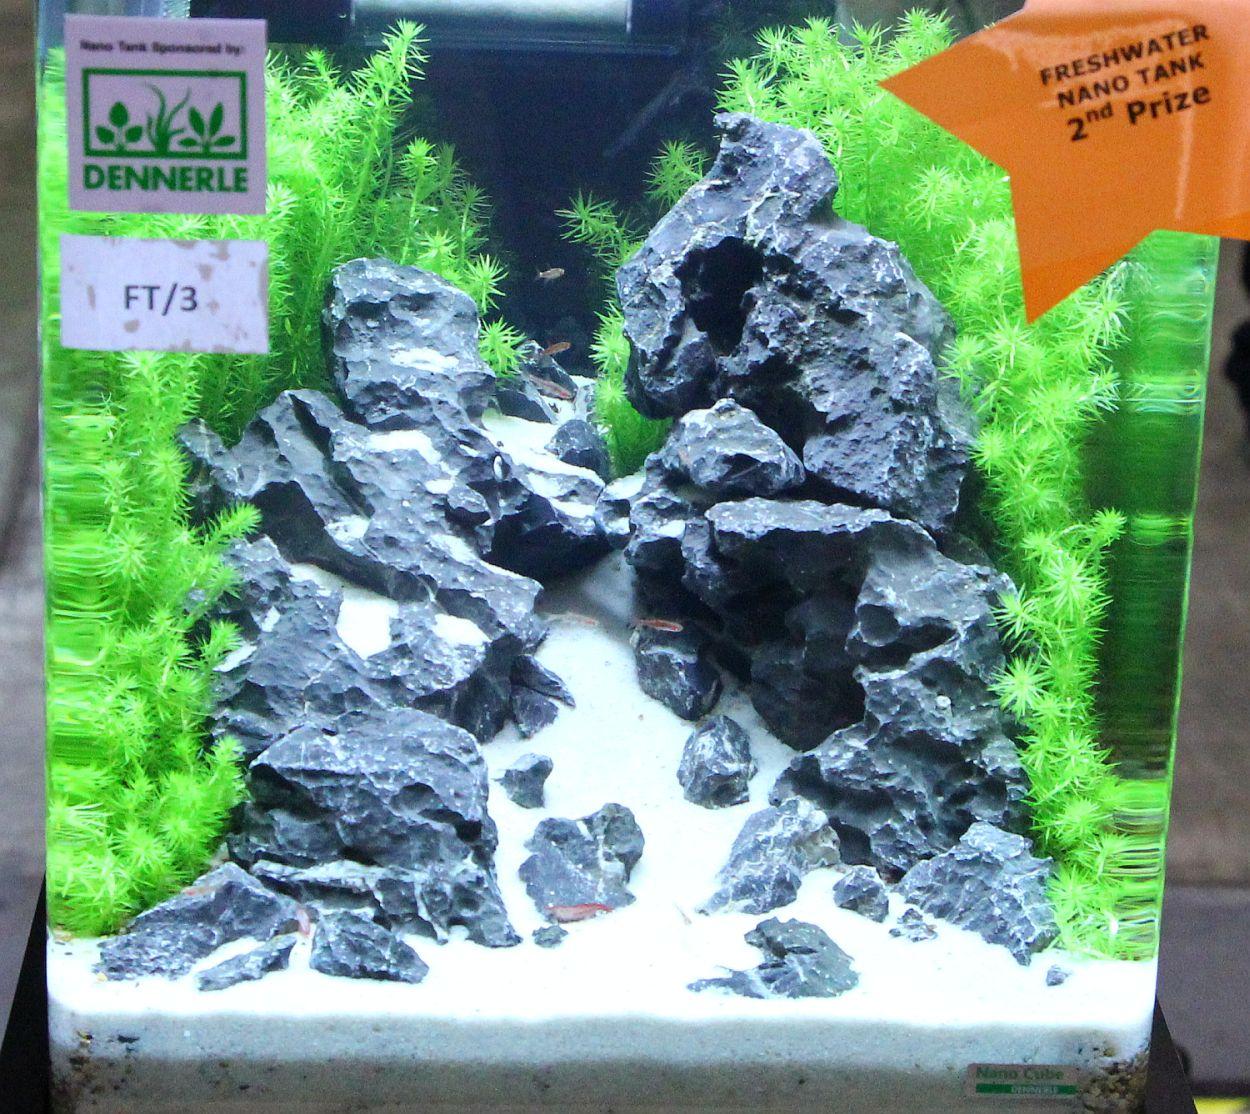 Fish for nano aquarium freshwater - Freshwater Nano Tank 1st Prize